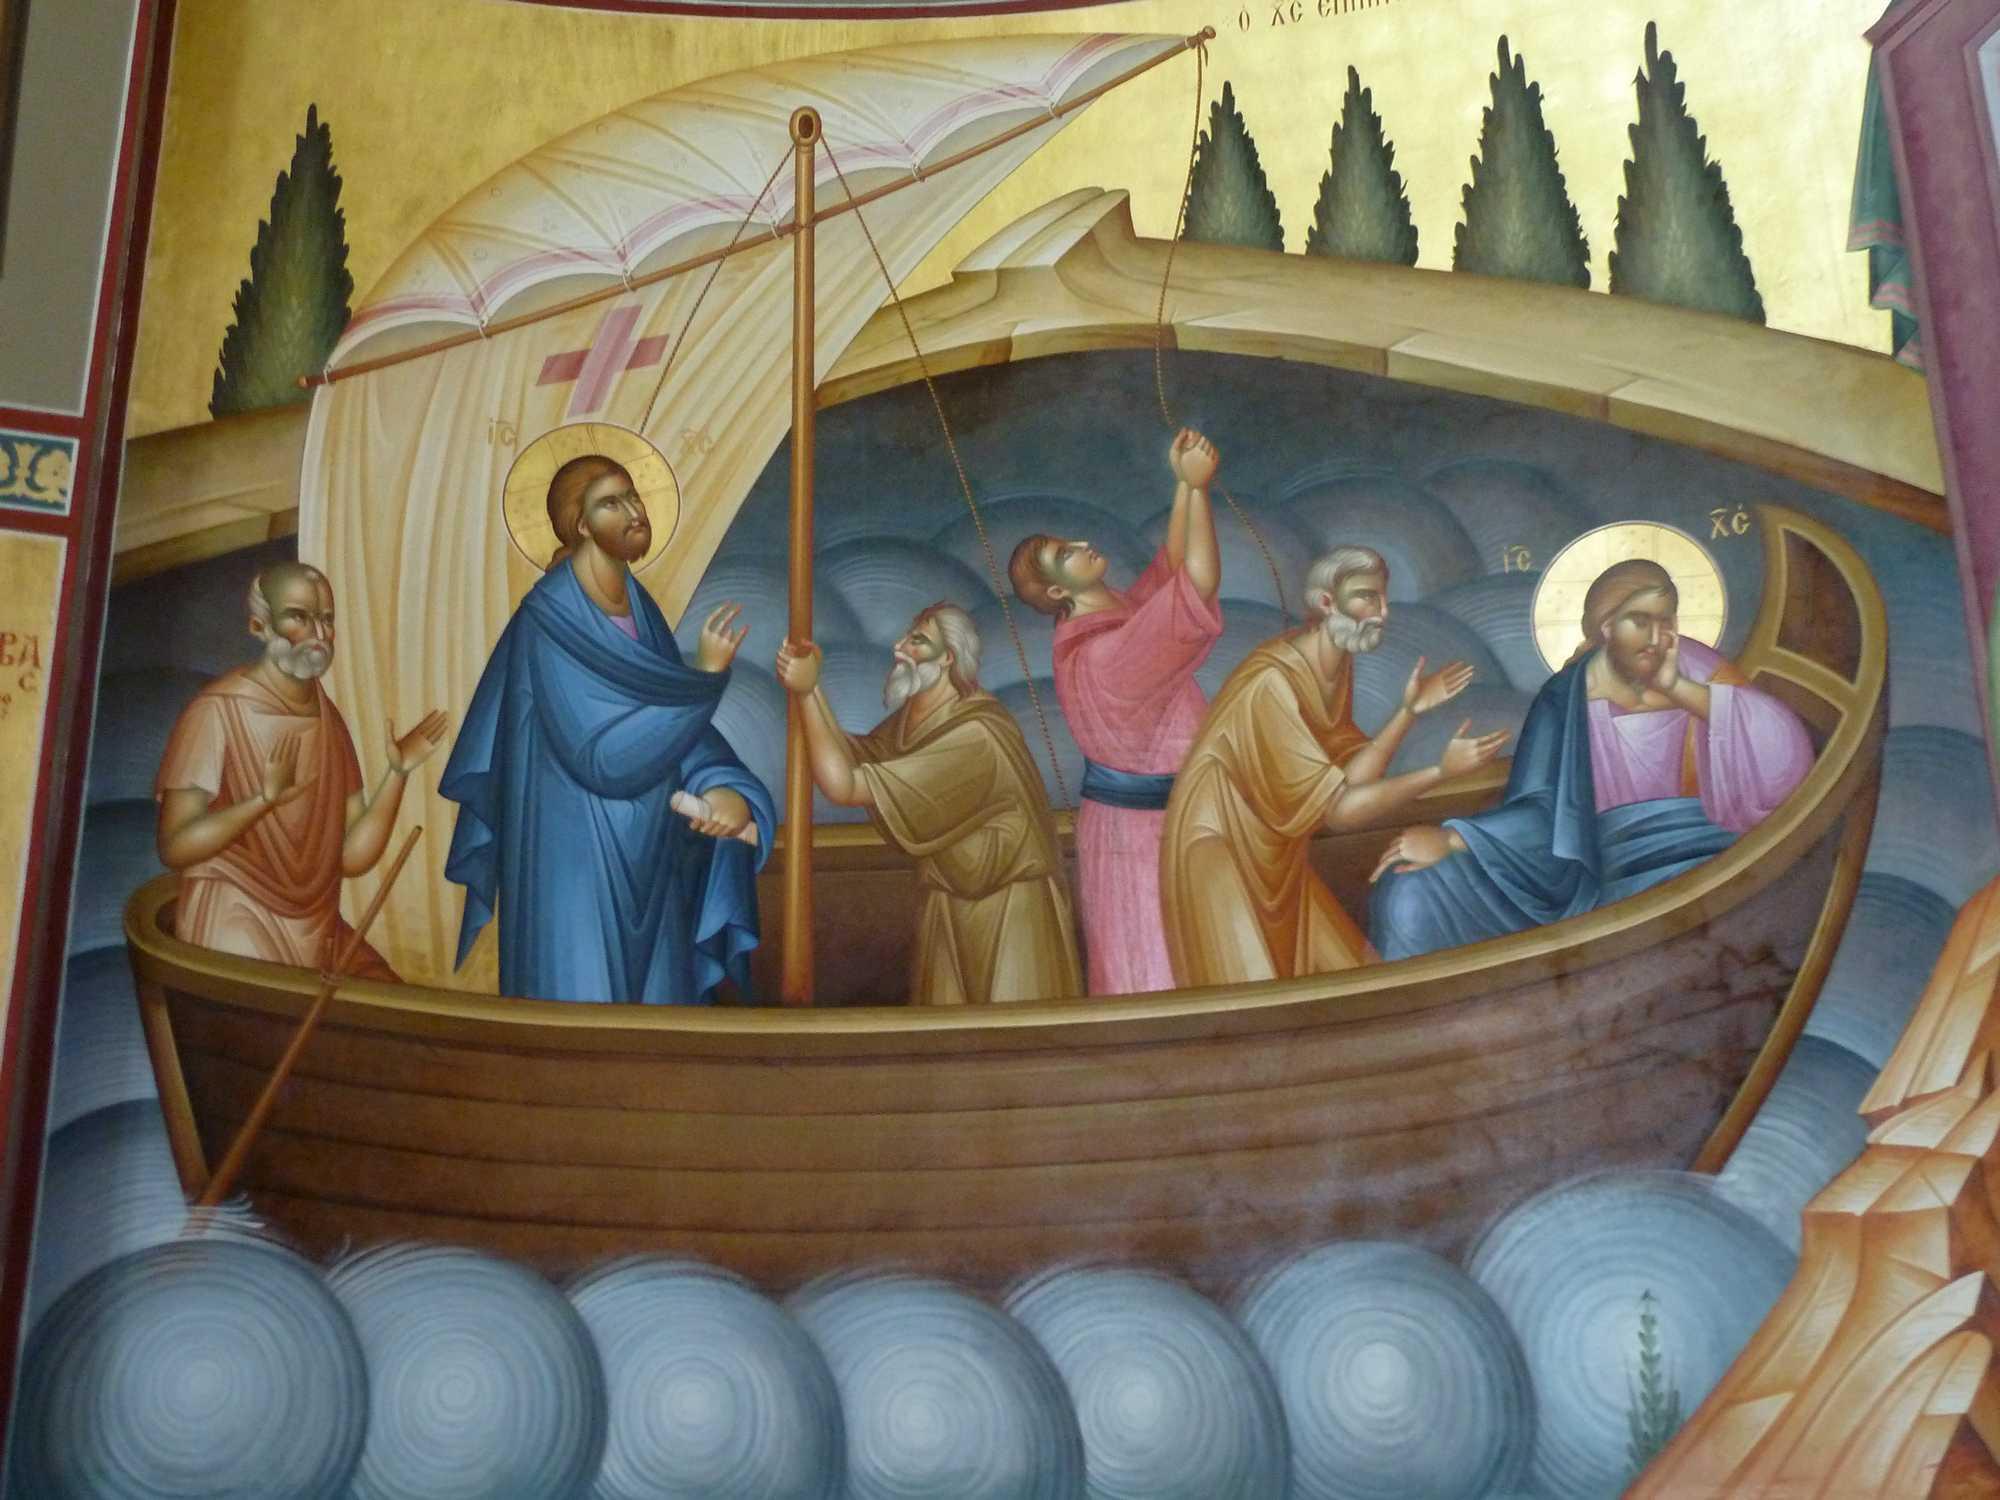 Jesus in boat with disciples  dans immagini sacre 2013-04-19_00119